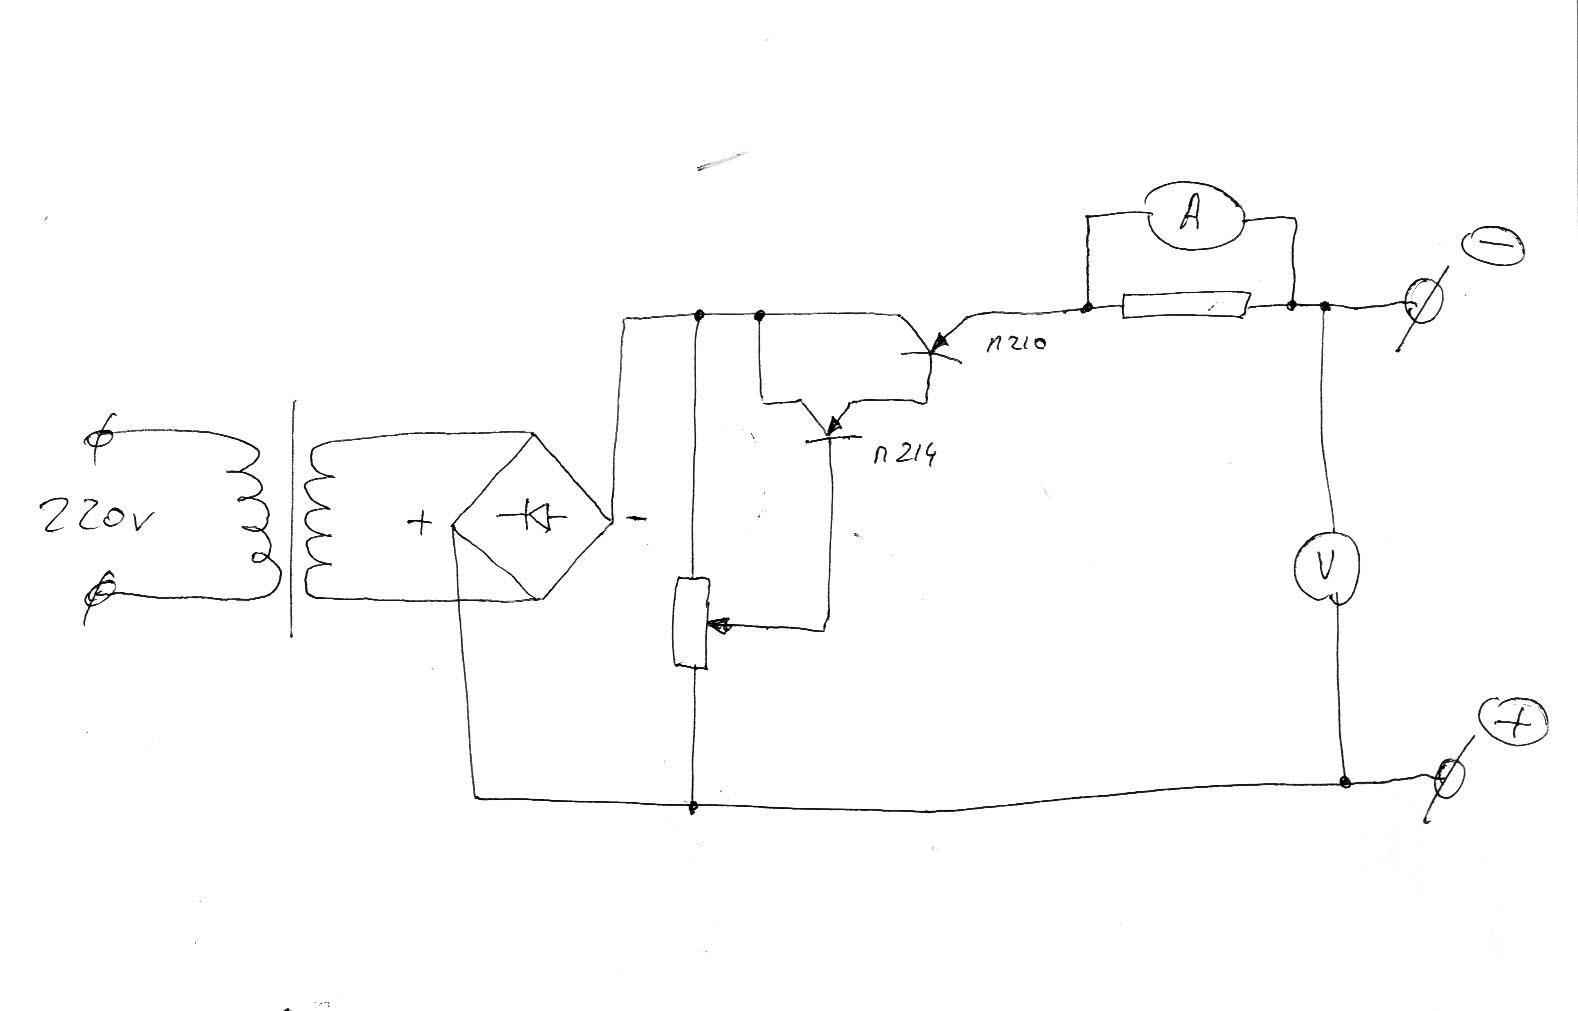 вилка нагрузочная для проверки аккумуляторов схема